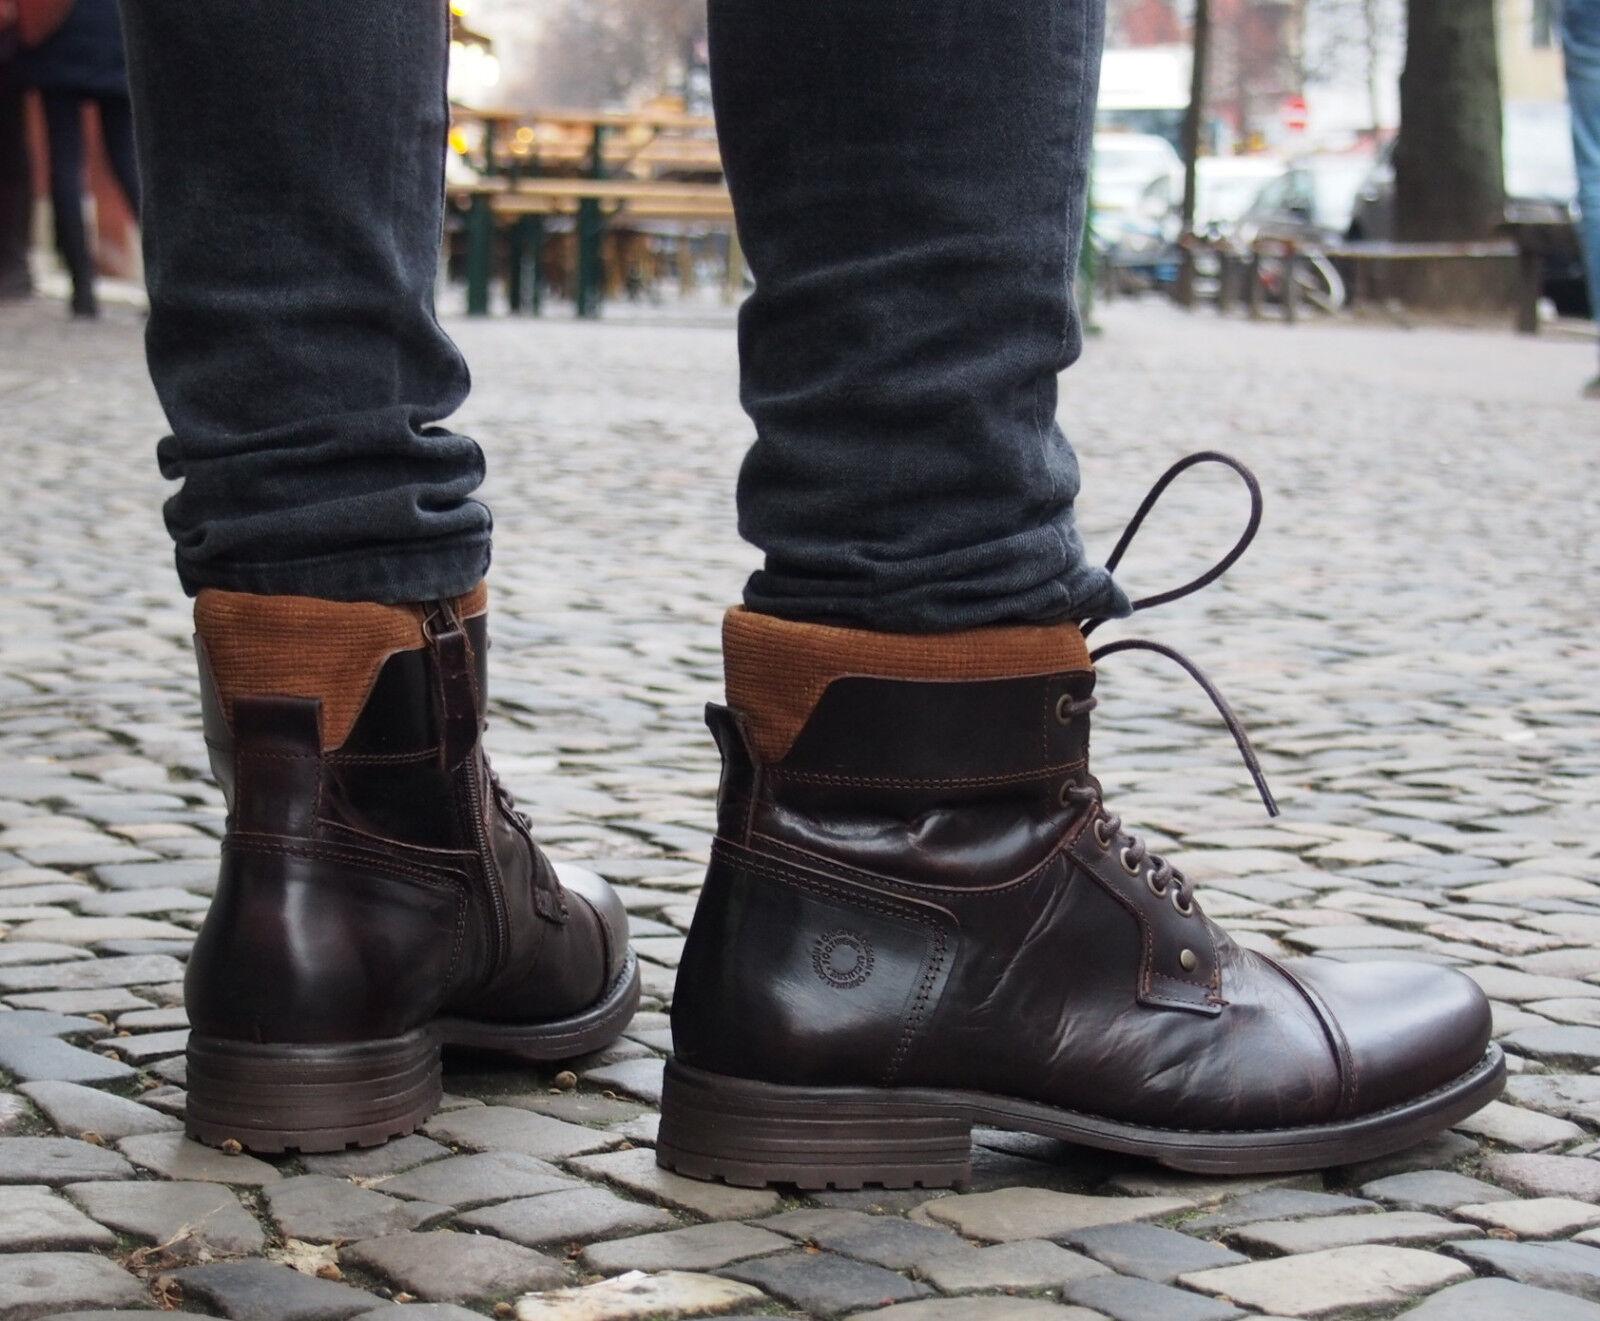 COXX BORBA Schuhe MAGOZ6144 brown braun Herrenschuhe Echtleder Boots Stiefel NEU